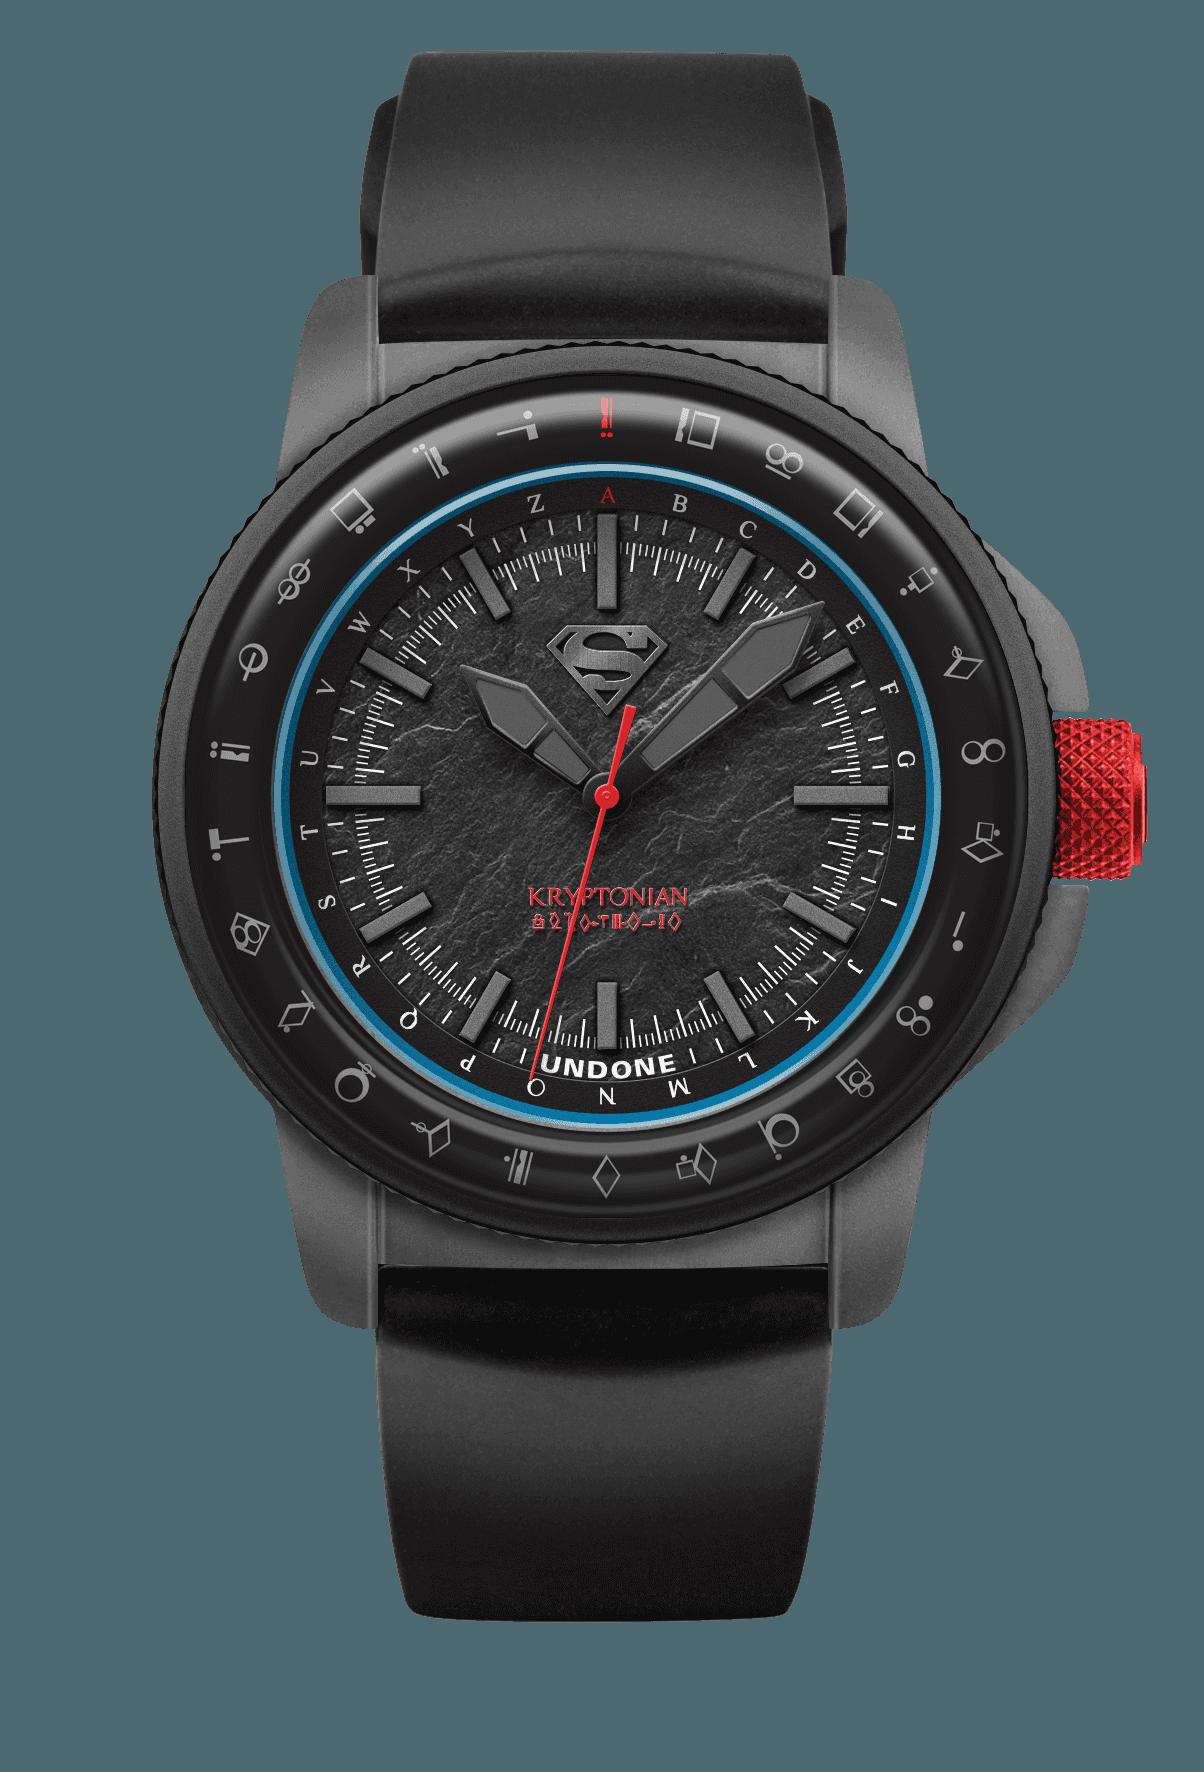 UNDONE アンダーン SUPERMAN スーパーマン コラボ腕時計 フロント